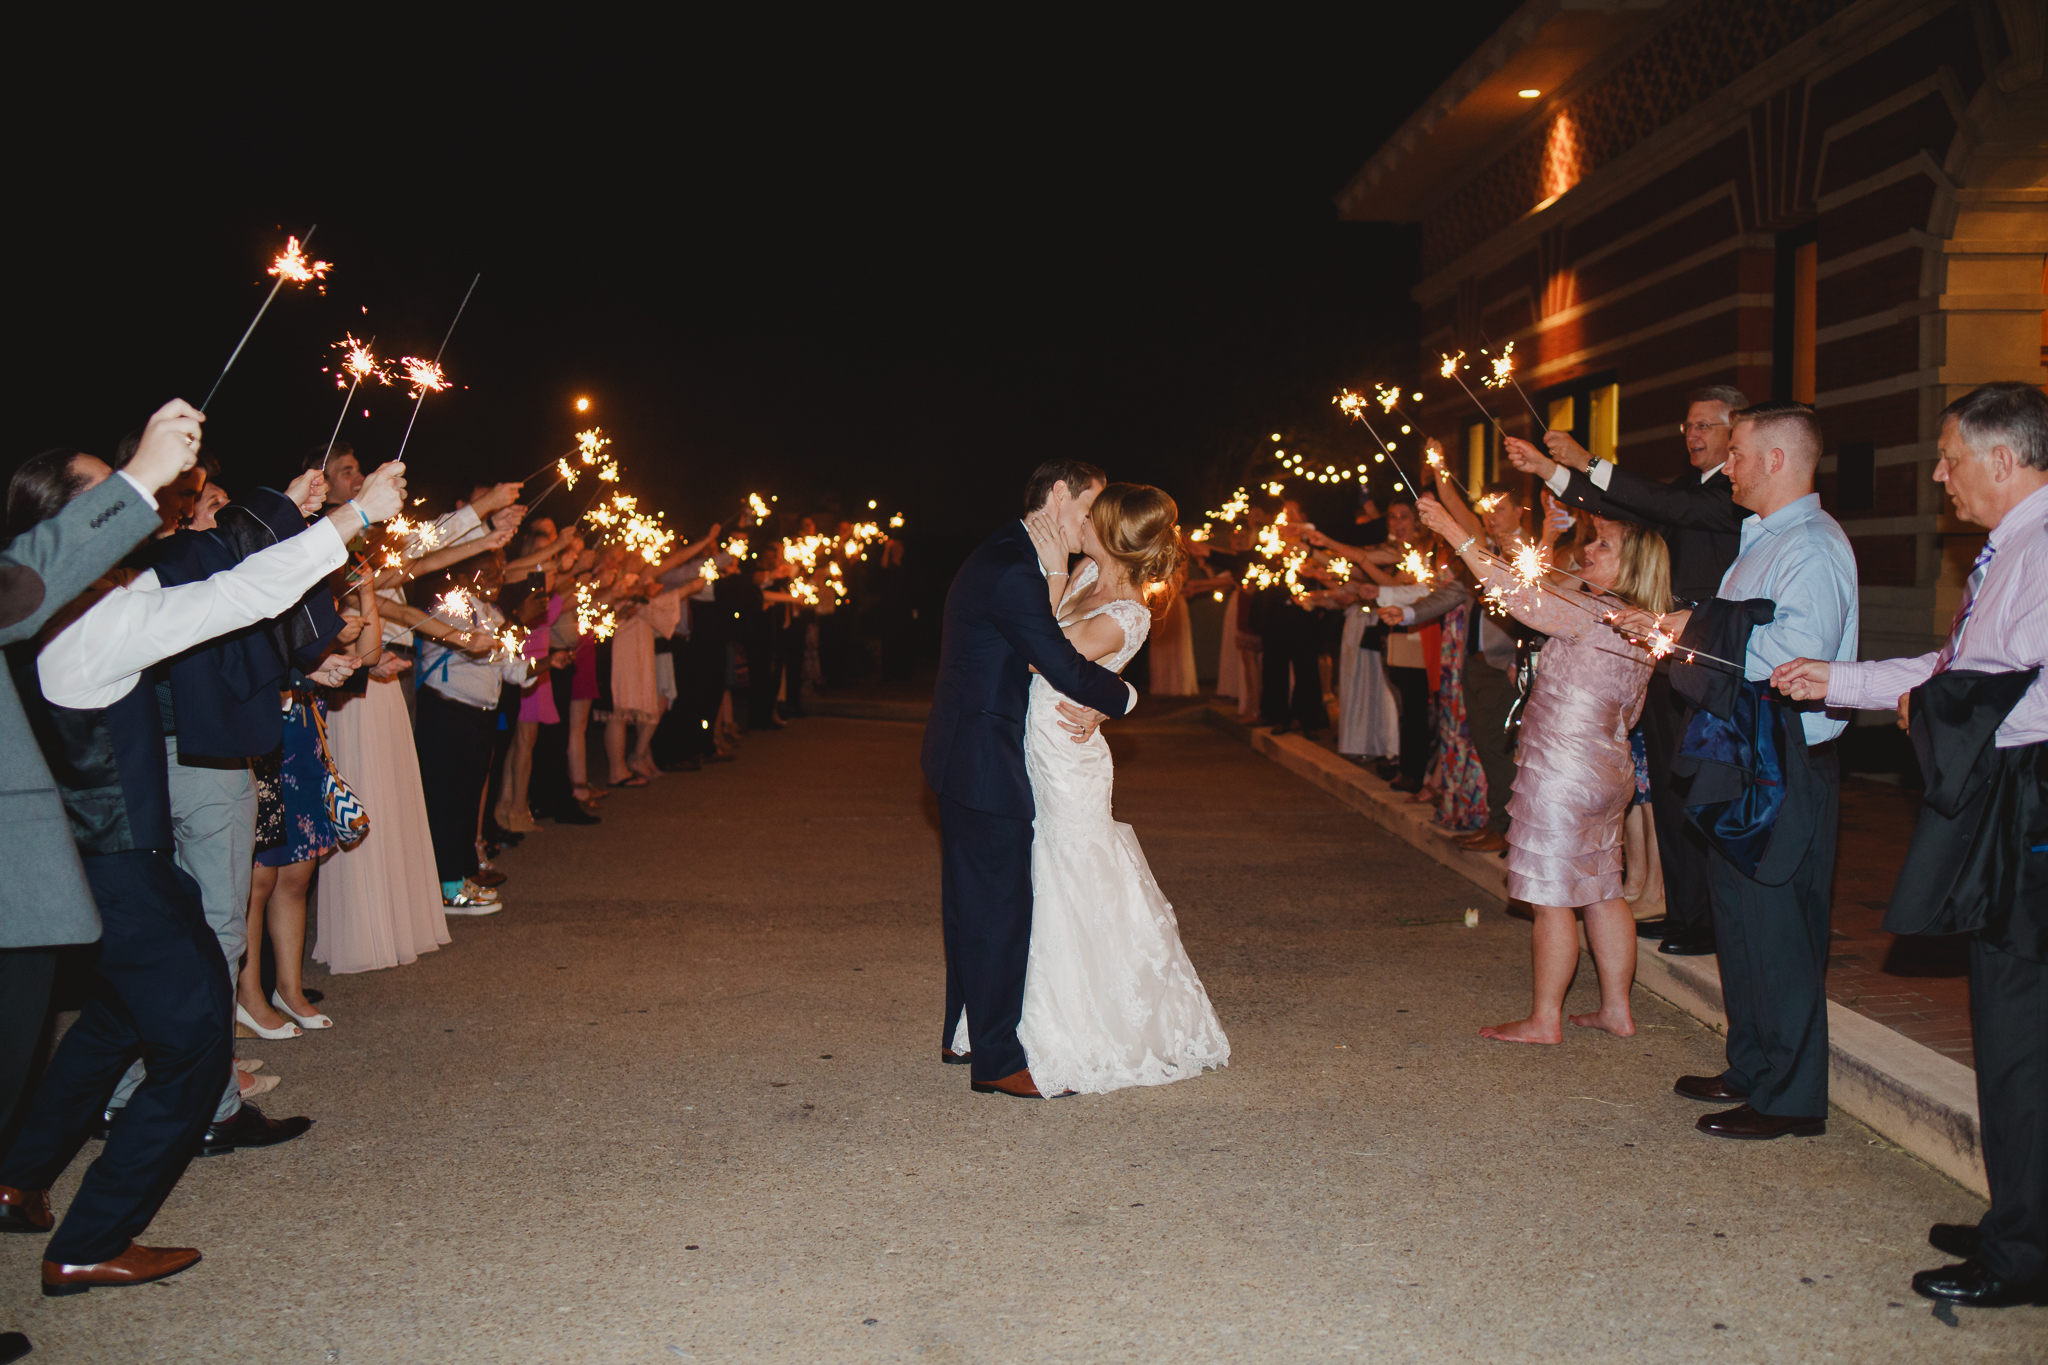 Michael and Kelly - the ashton depot - wedding DFW - wedding photographer- elizalde photography (150 of 150).jpg